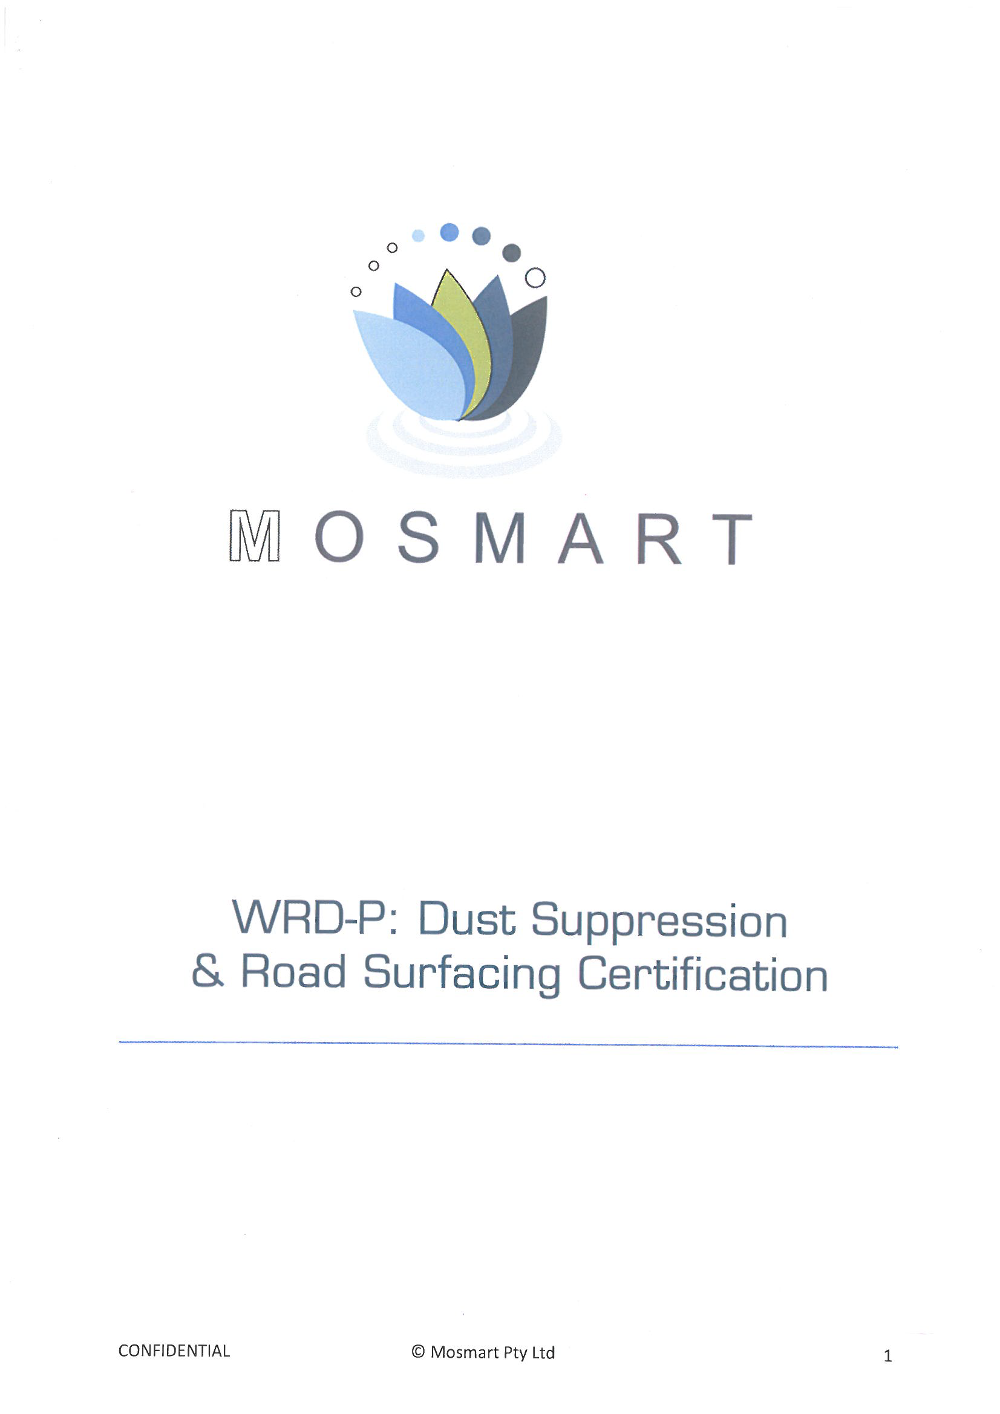 mossmart-sabs-certification